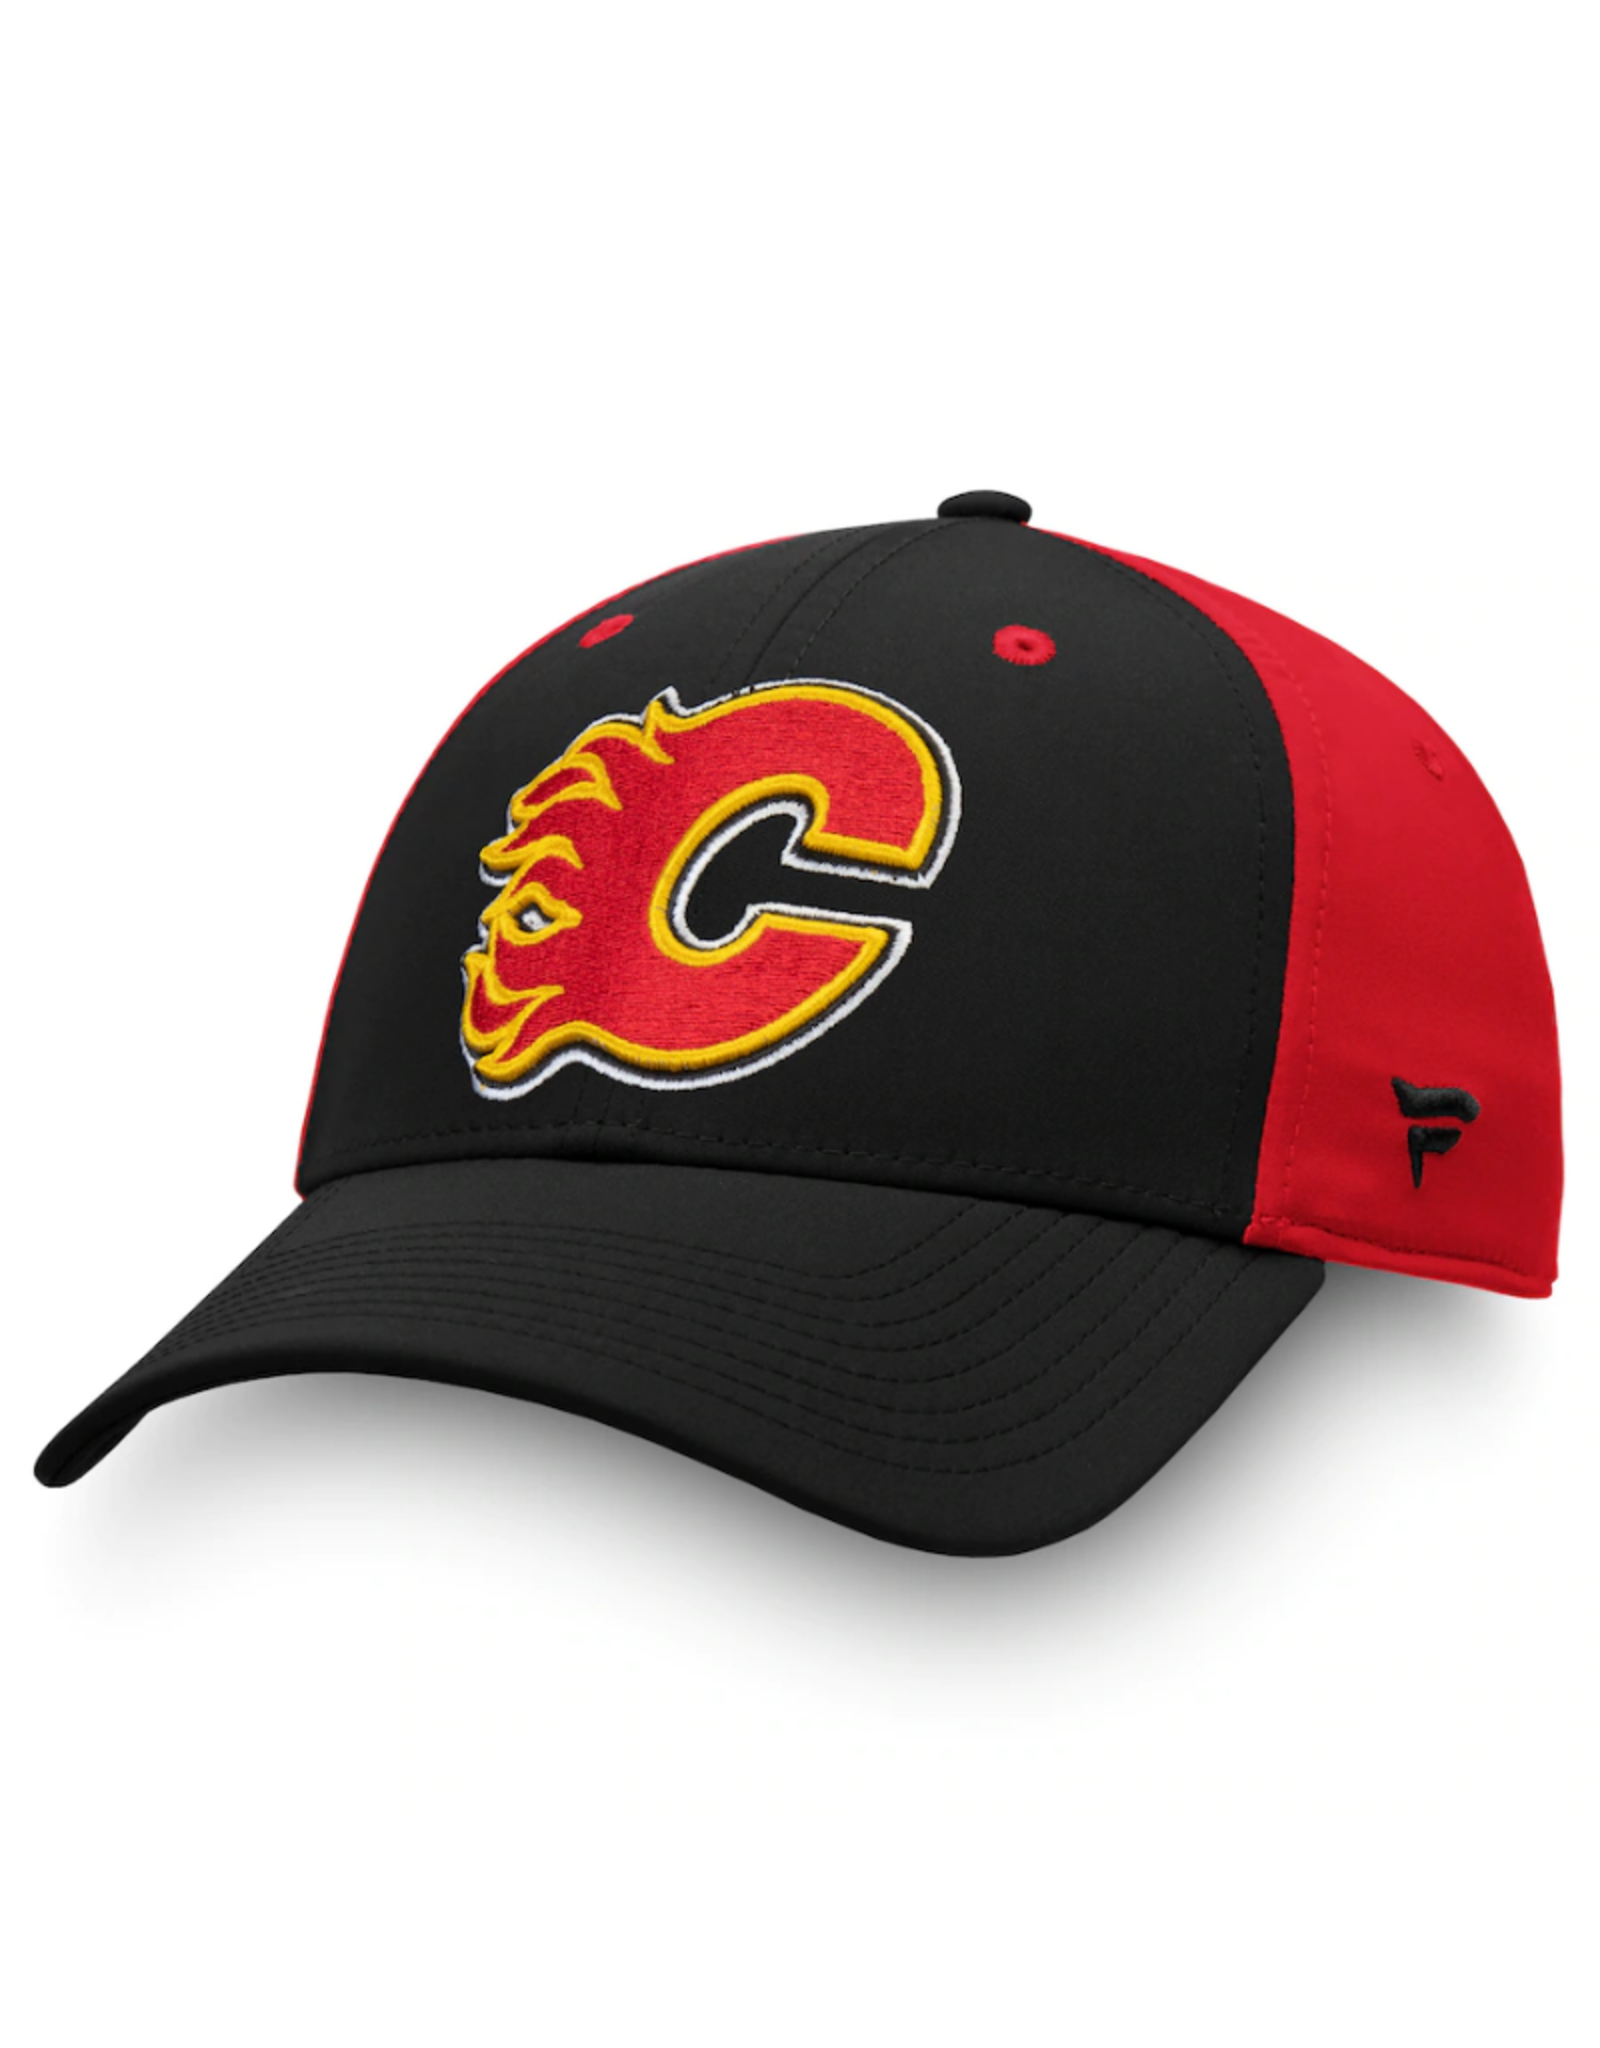 Fanatics Fanatics Men's Iconic Stretch Hat Calgary Flames Black/Red